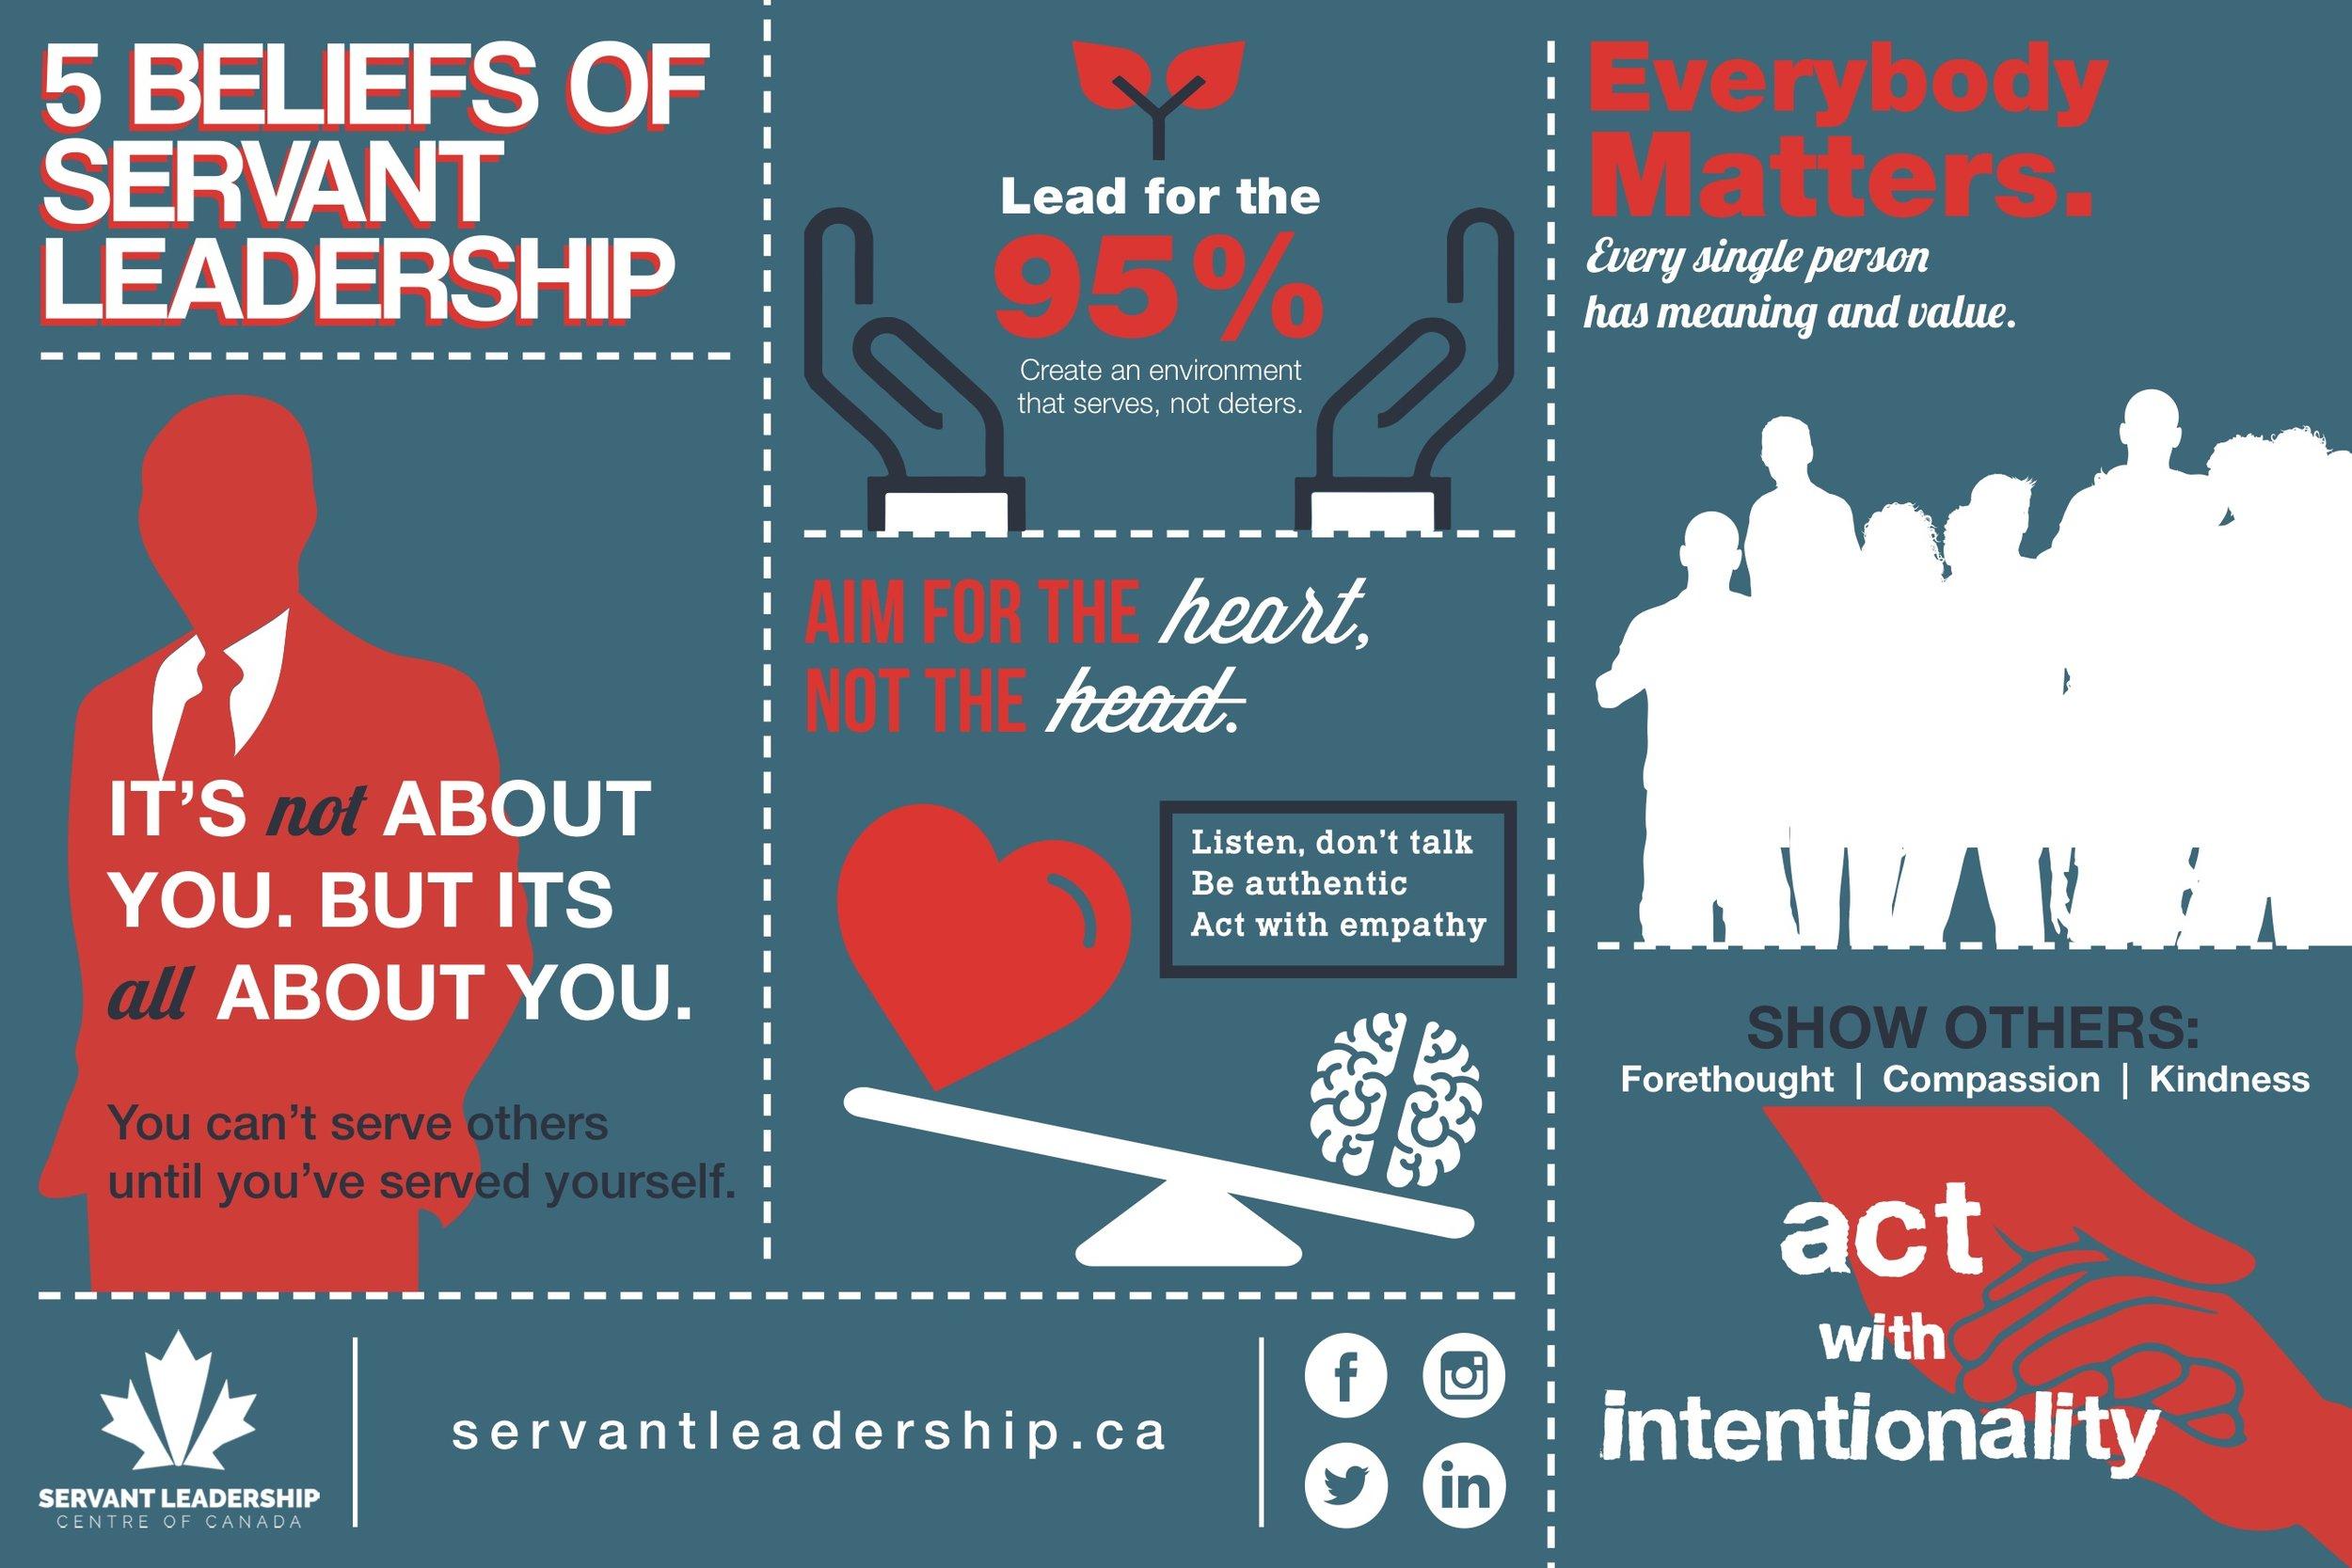 The 5 Beliefs of Servant Leadership Poster